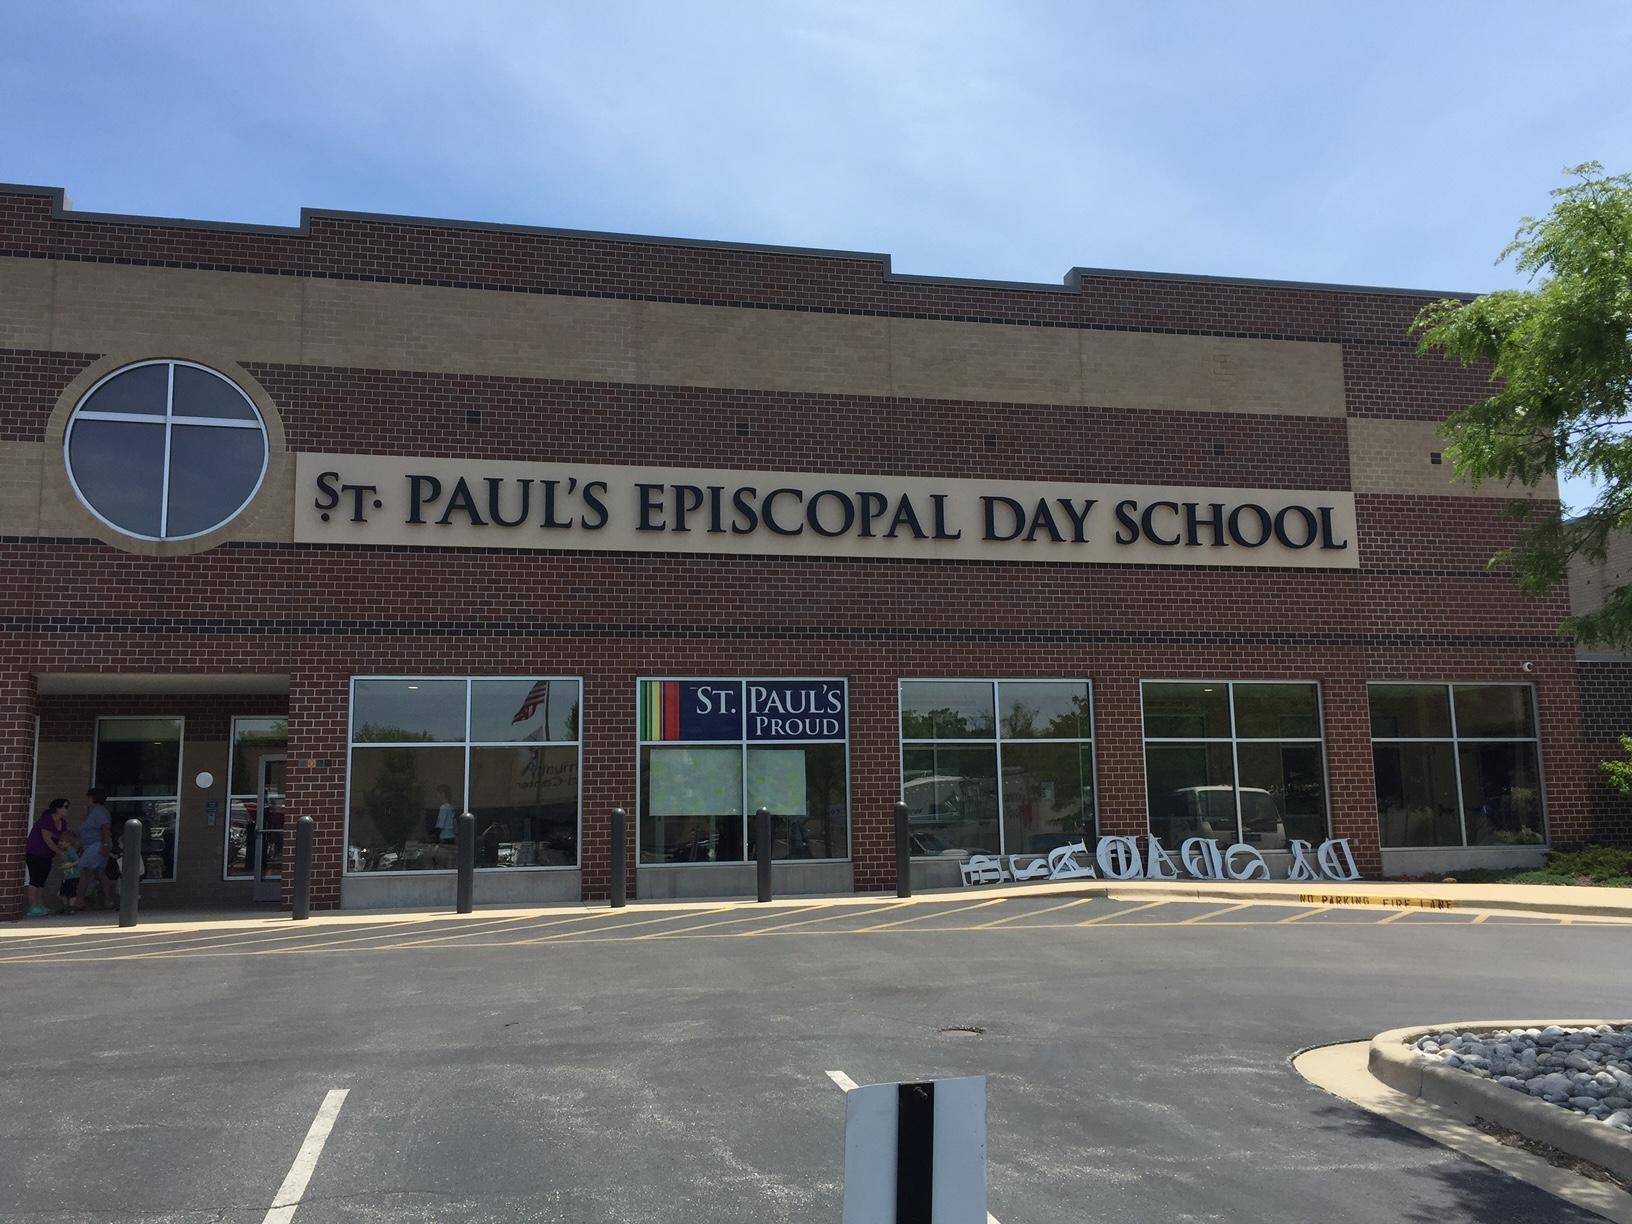 St Pauls Episcopal Day School Exterior (4).JPG